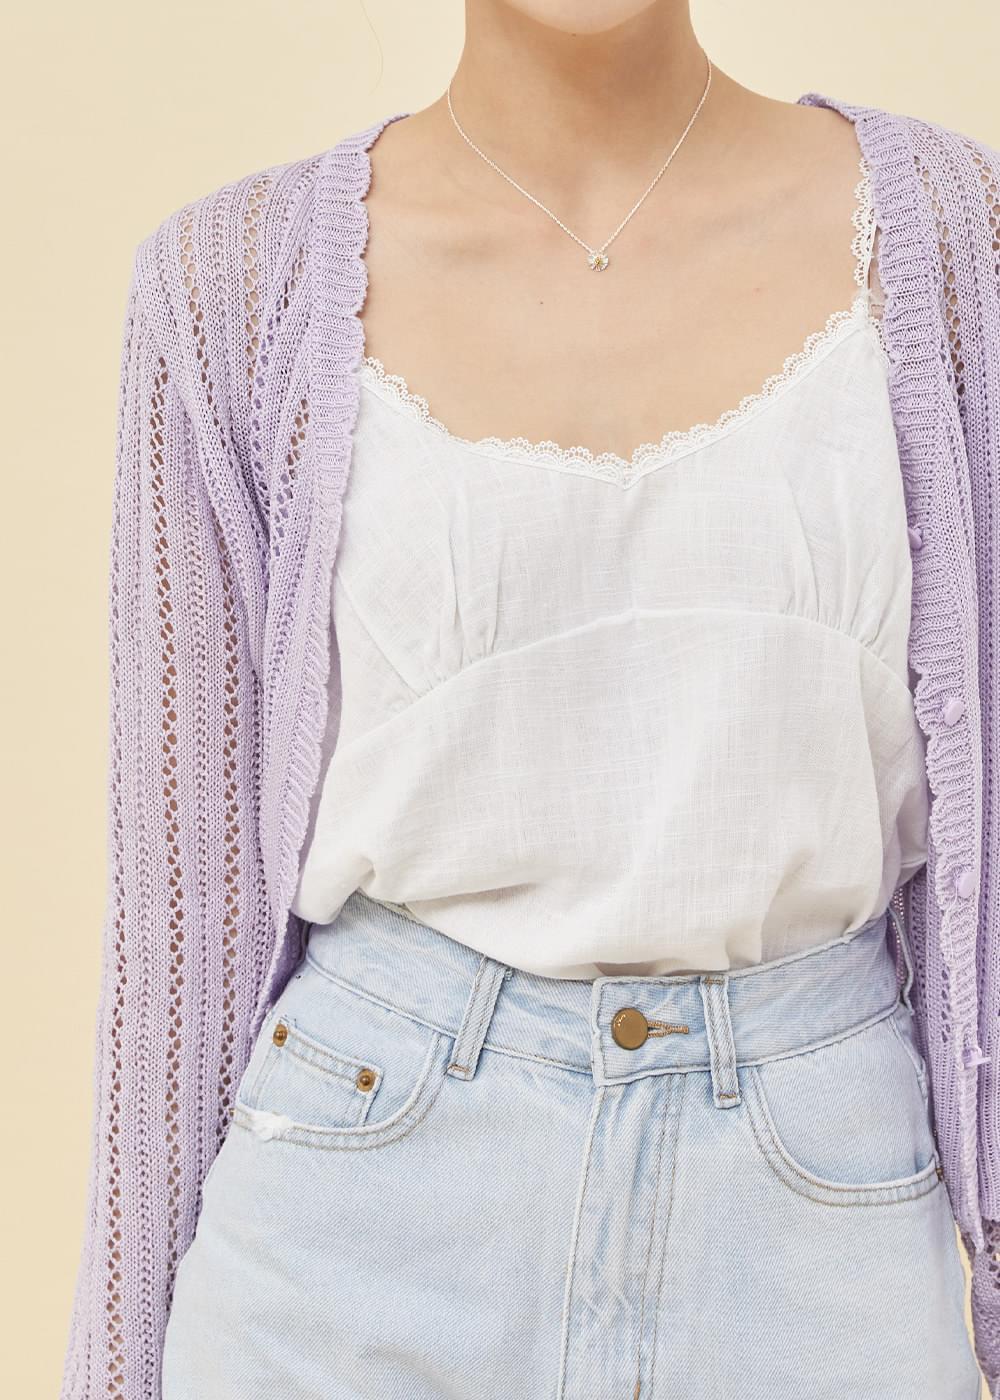 Lace linen sleeveless